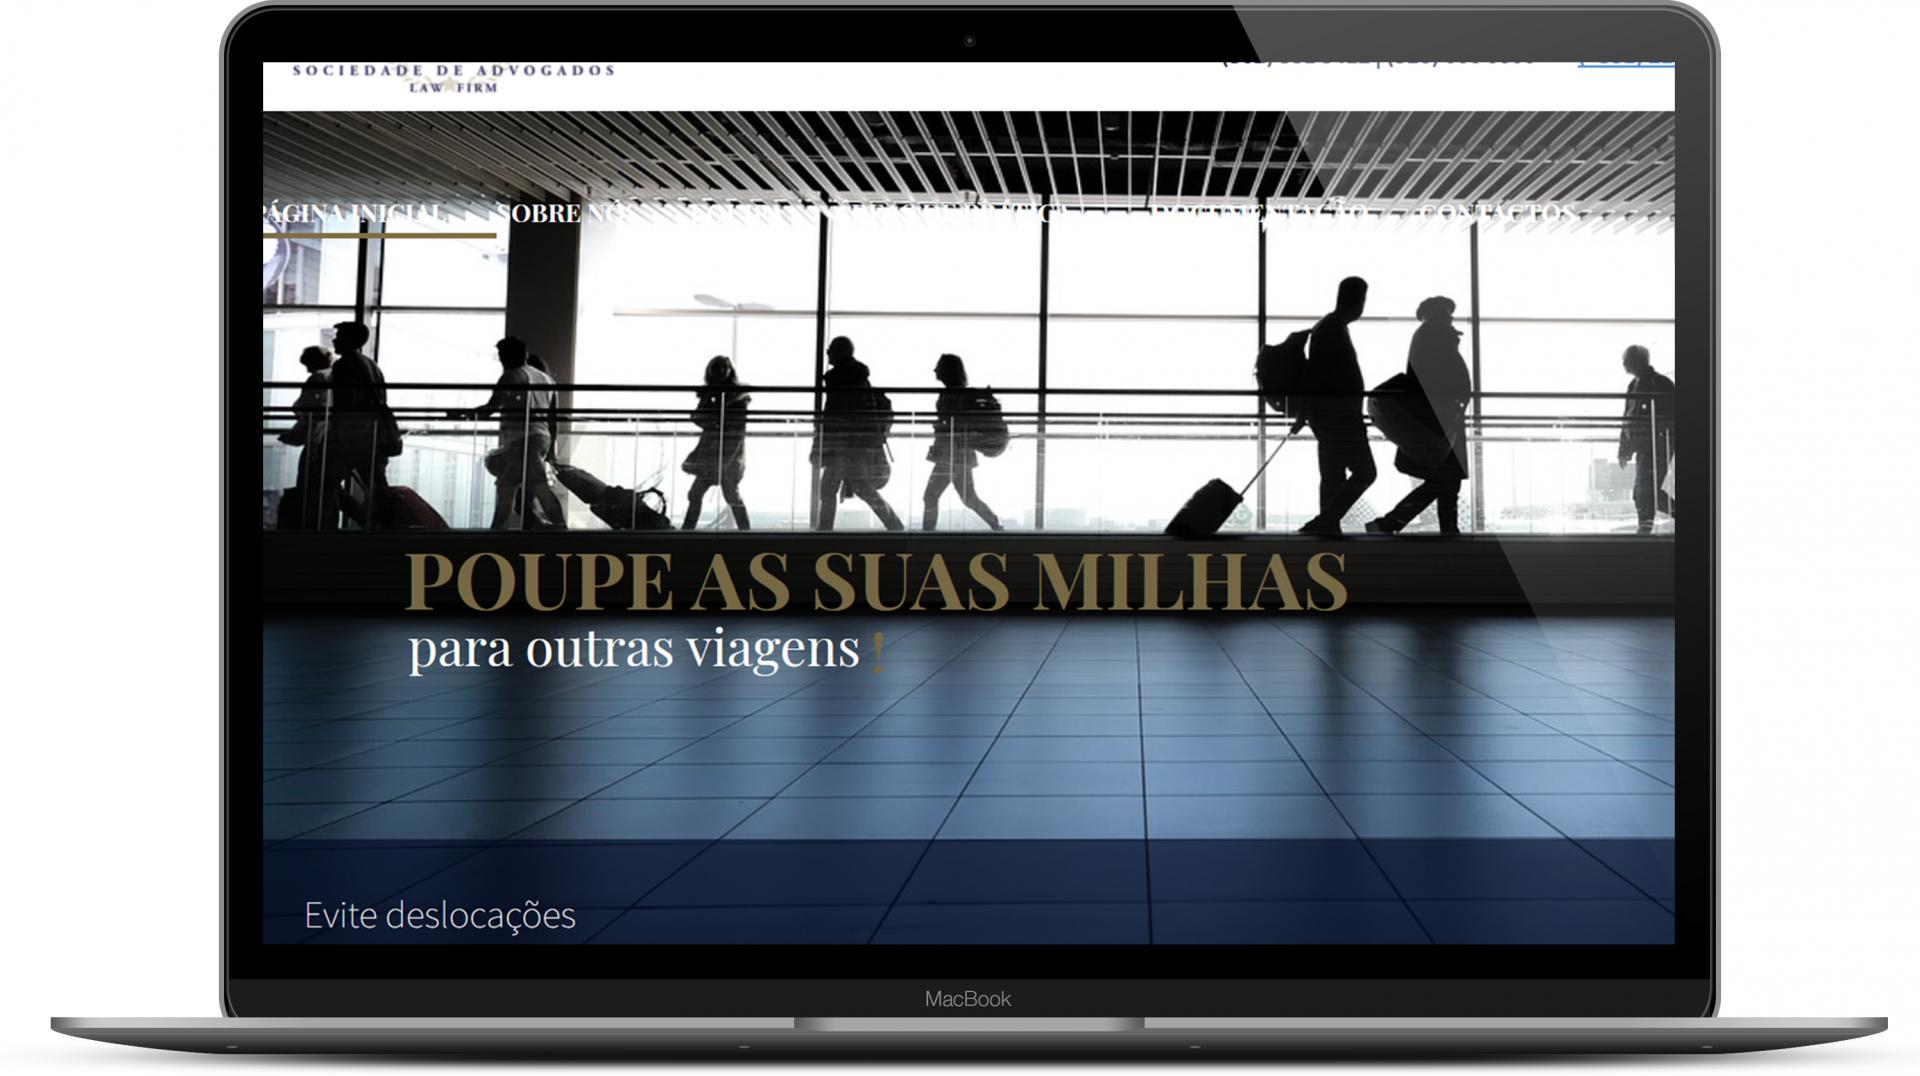 WEB SITE Advogados DESIGN Lisboa